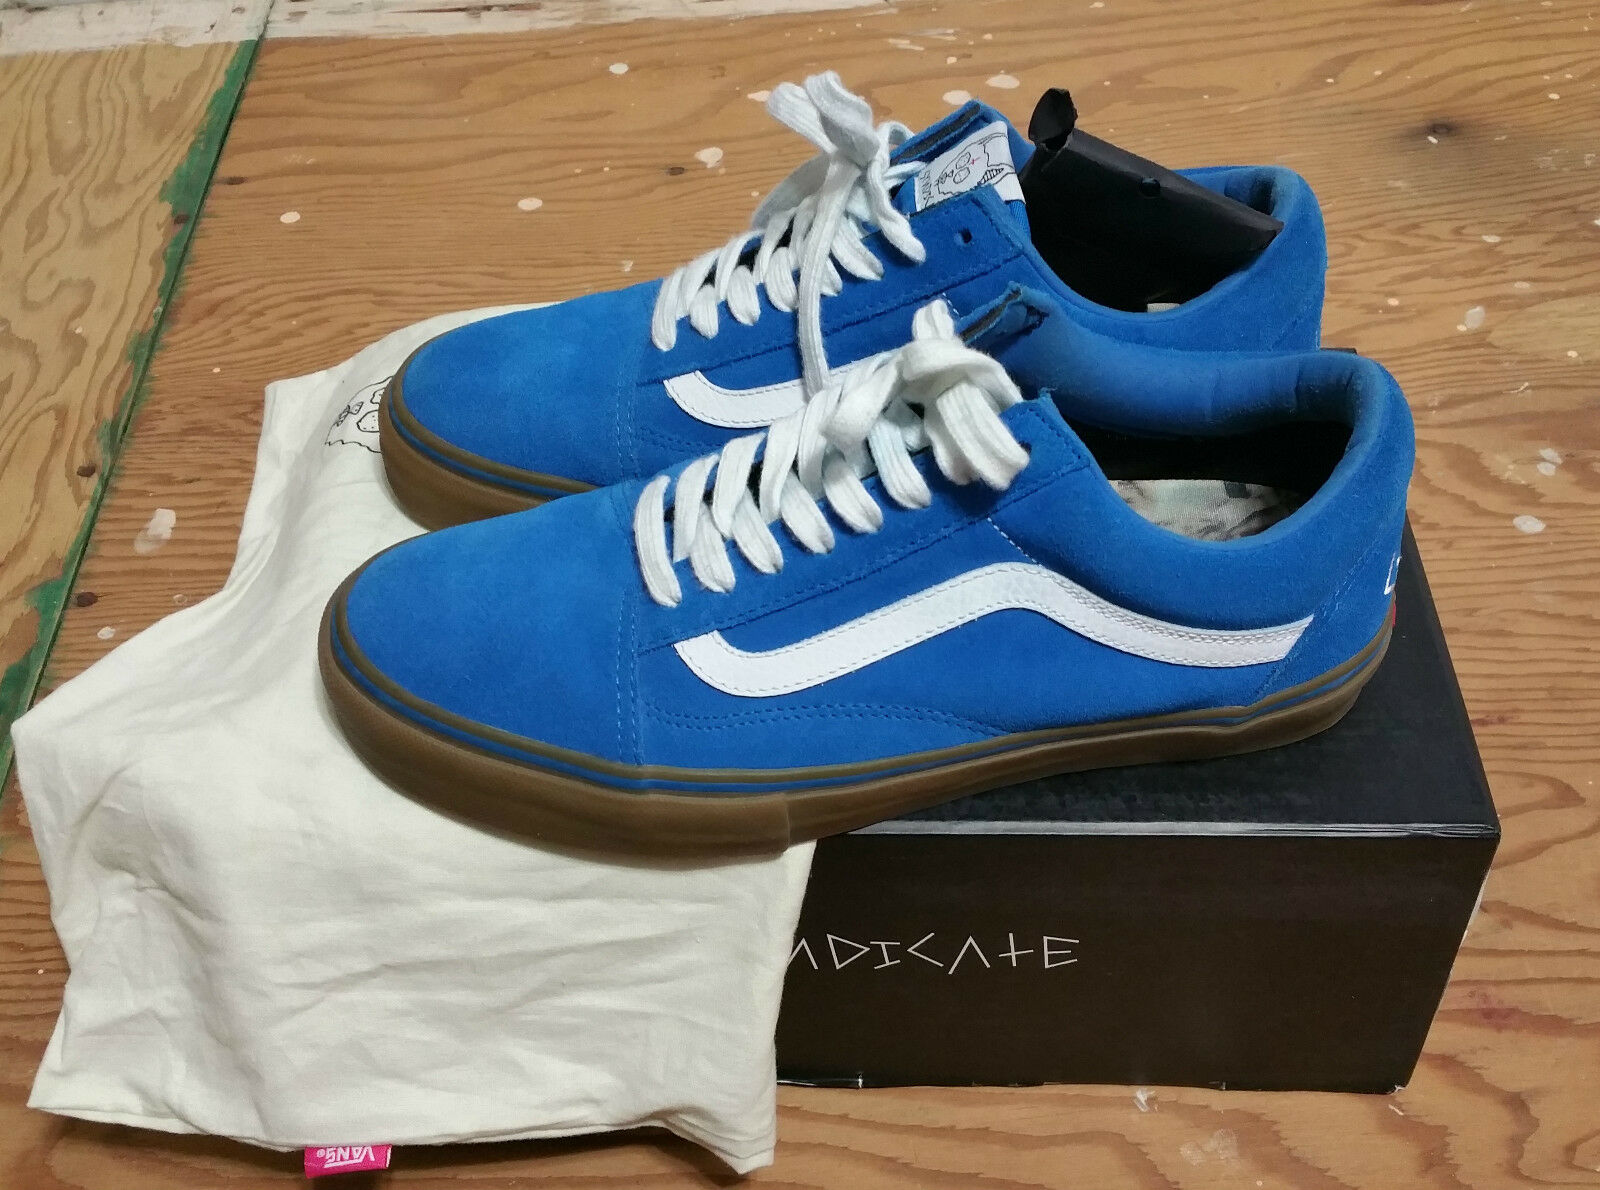 VANS X Golf Wang X Syndicate Old Skool Blue Gum Size 8 supreme wtaps wolf gang